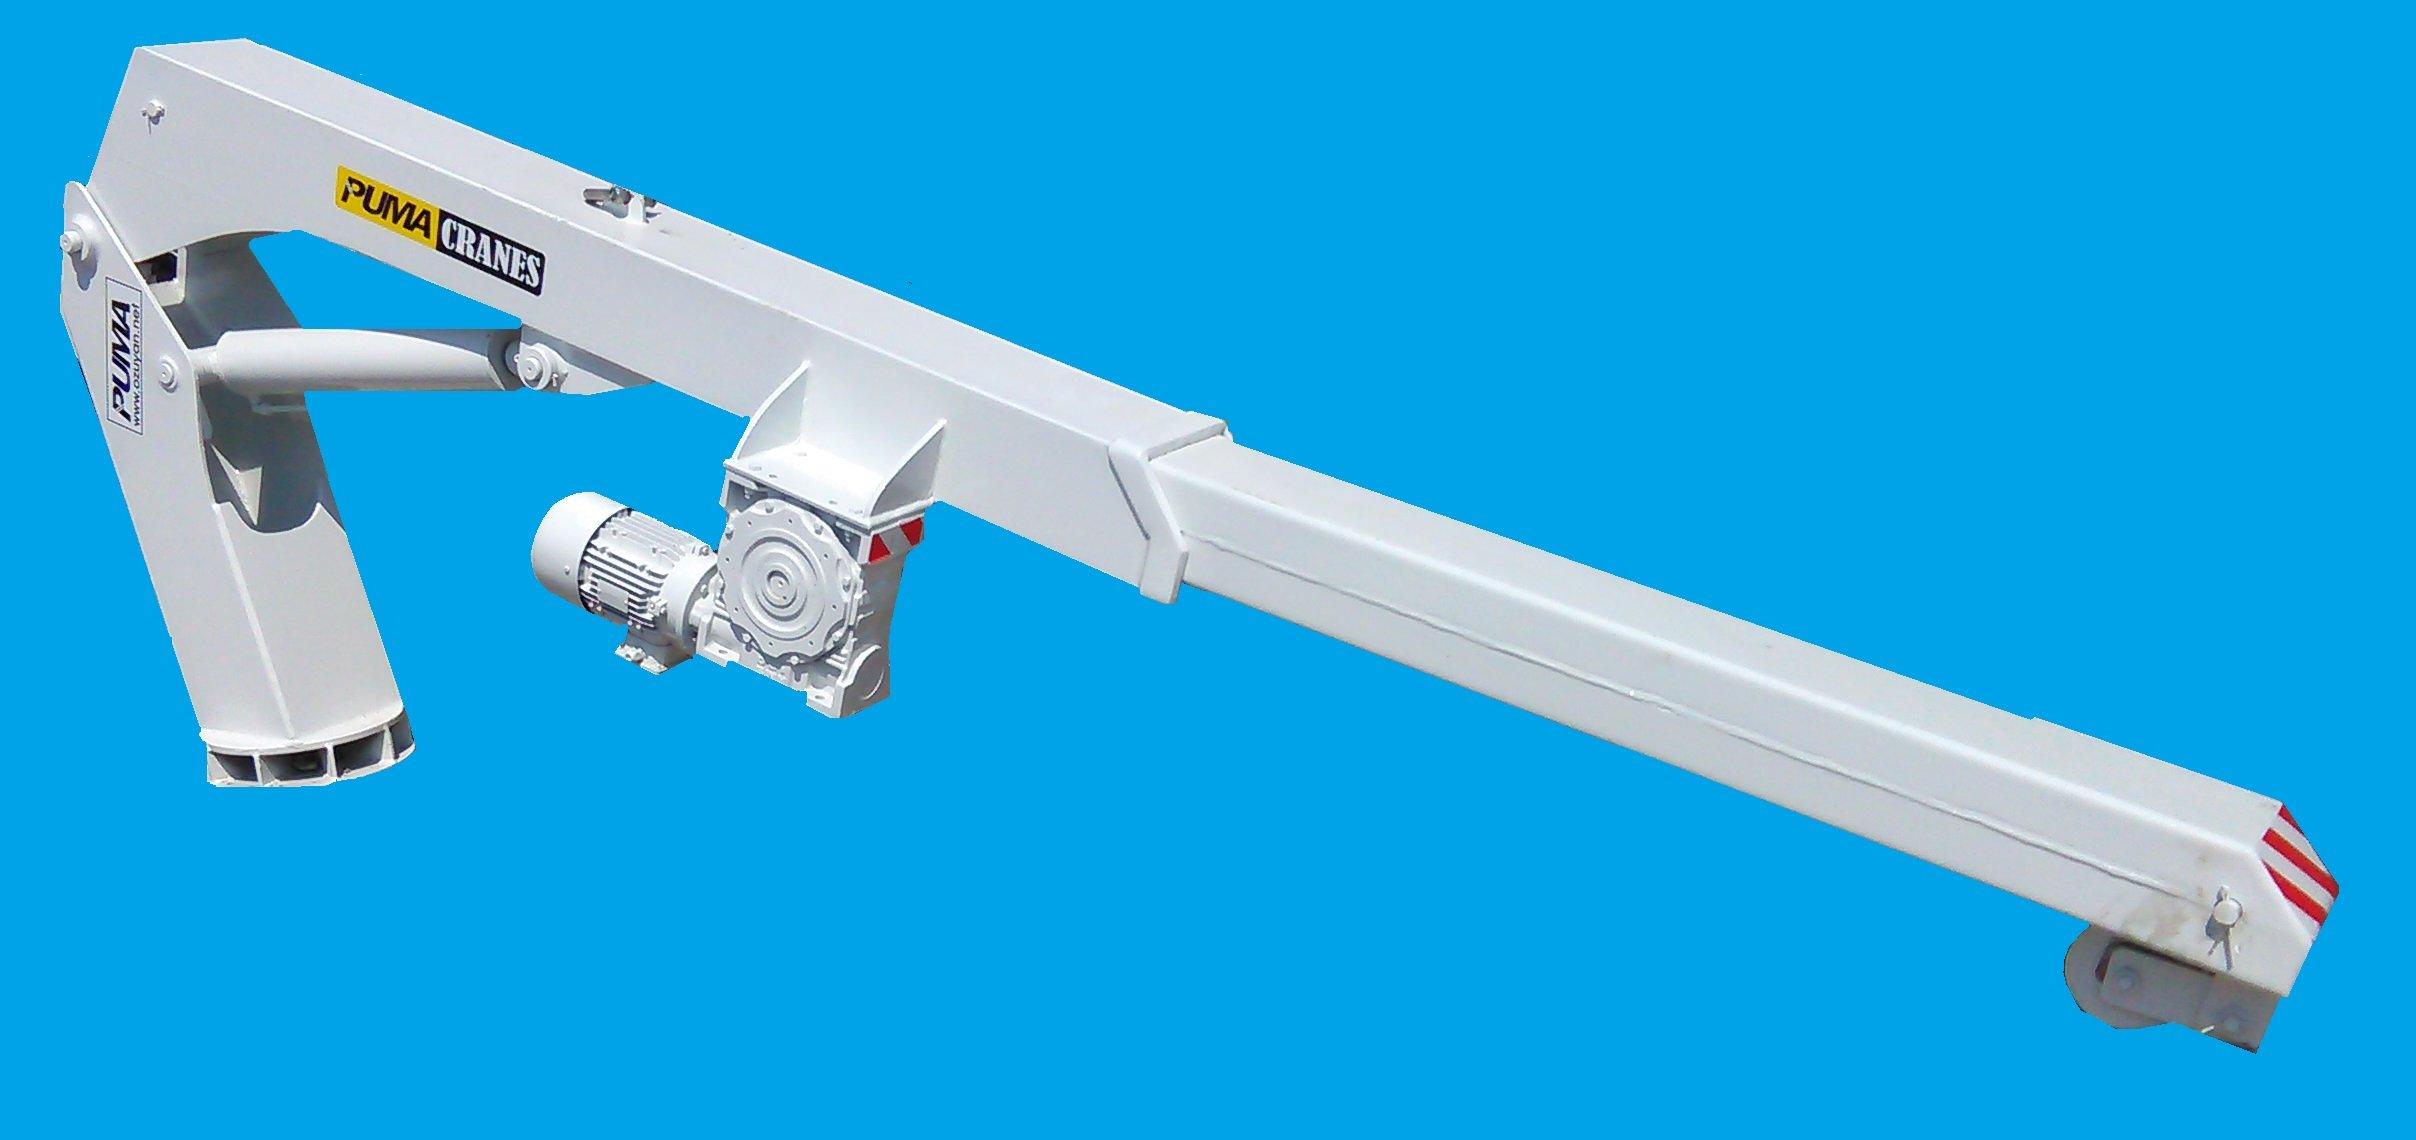 puma-marine-crane950391.jpg